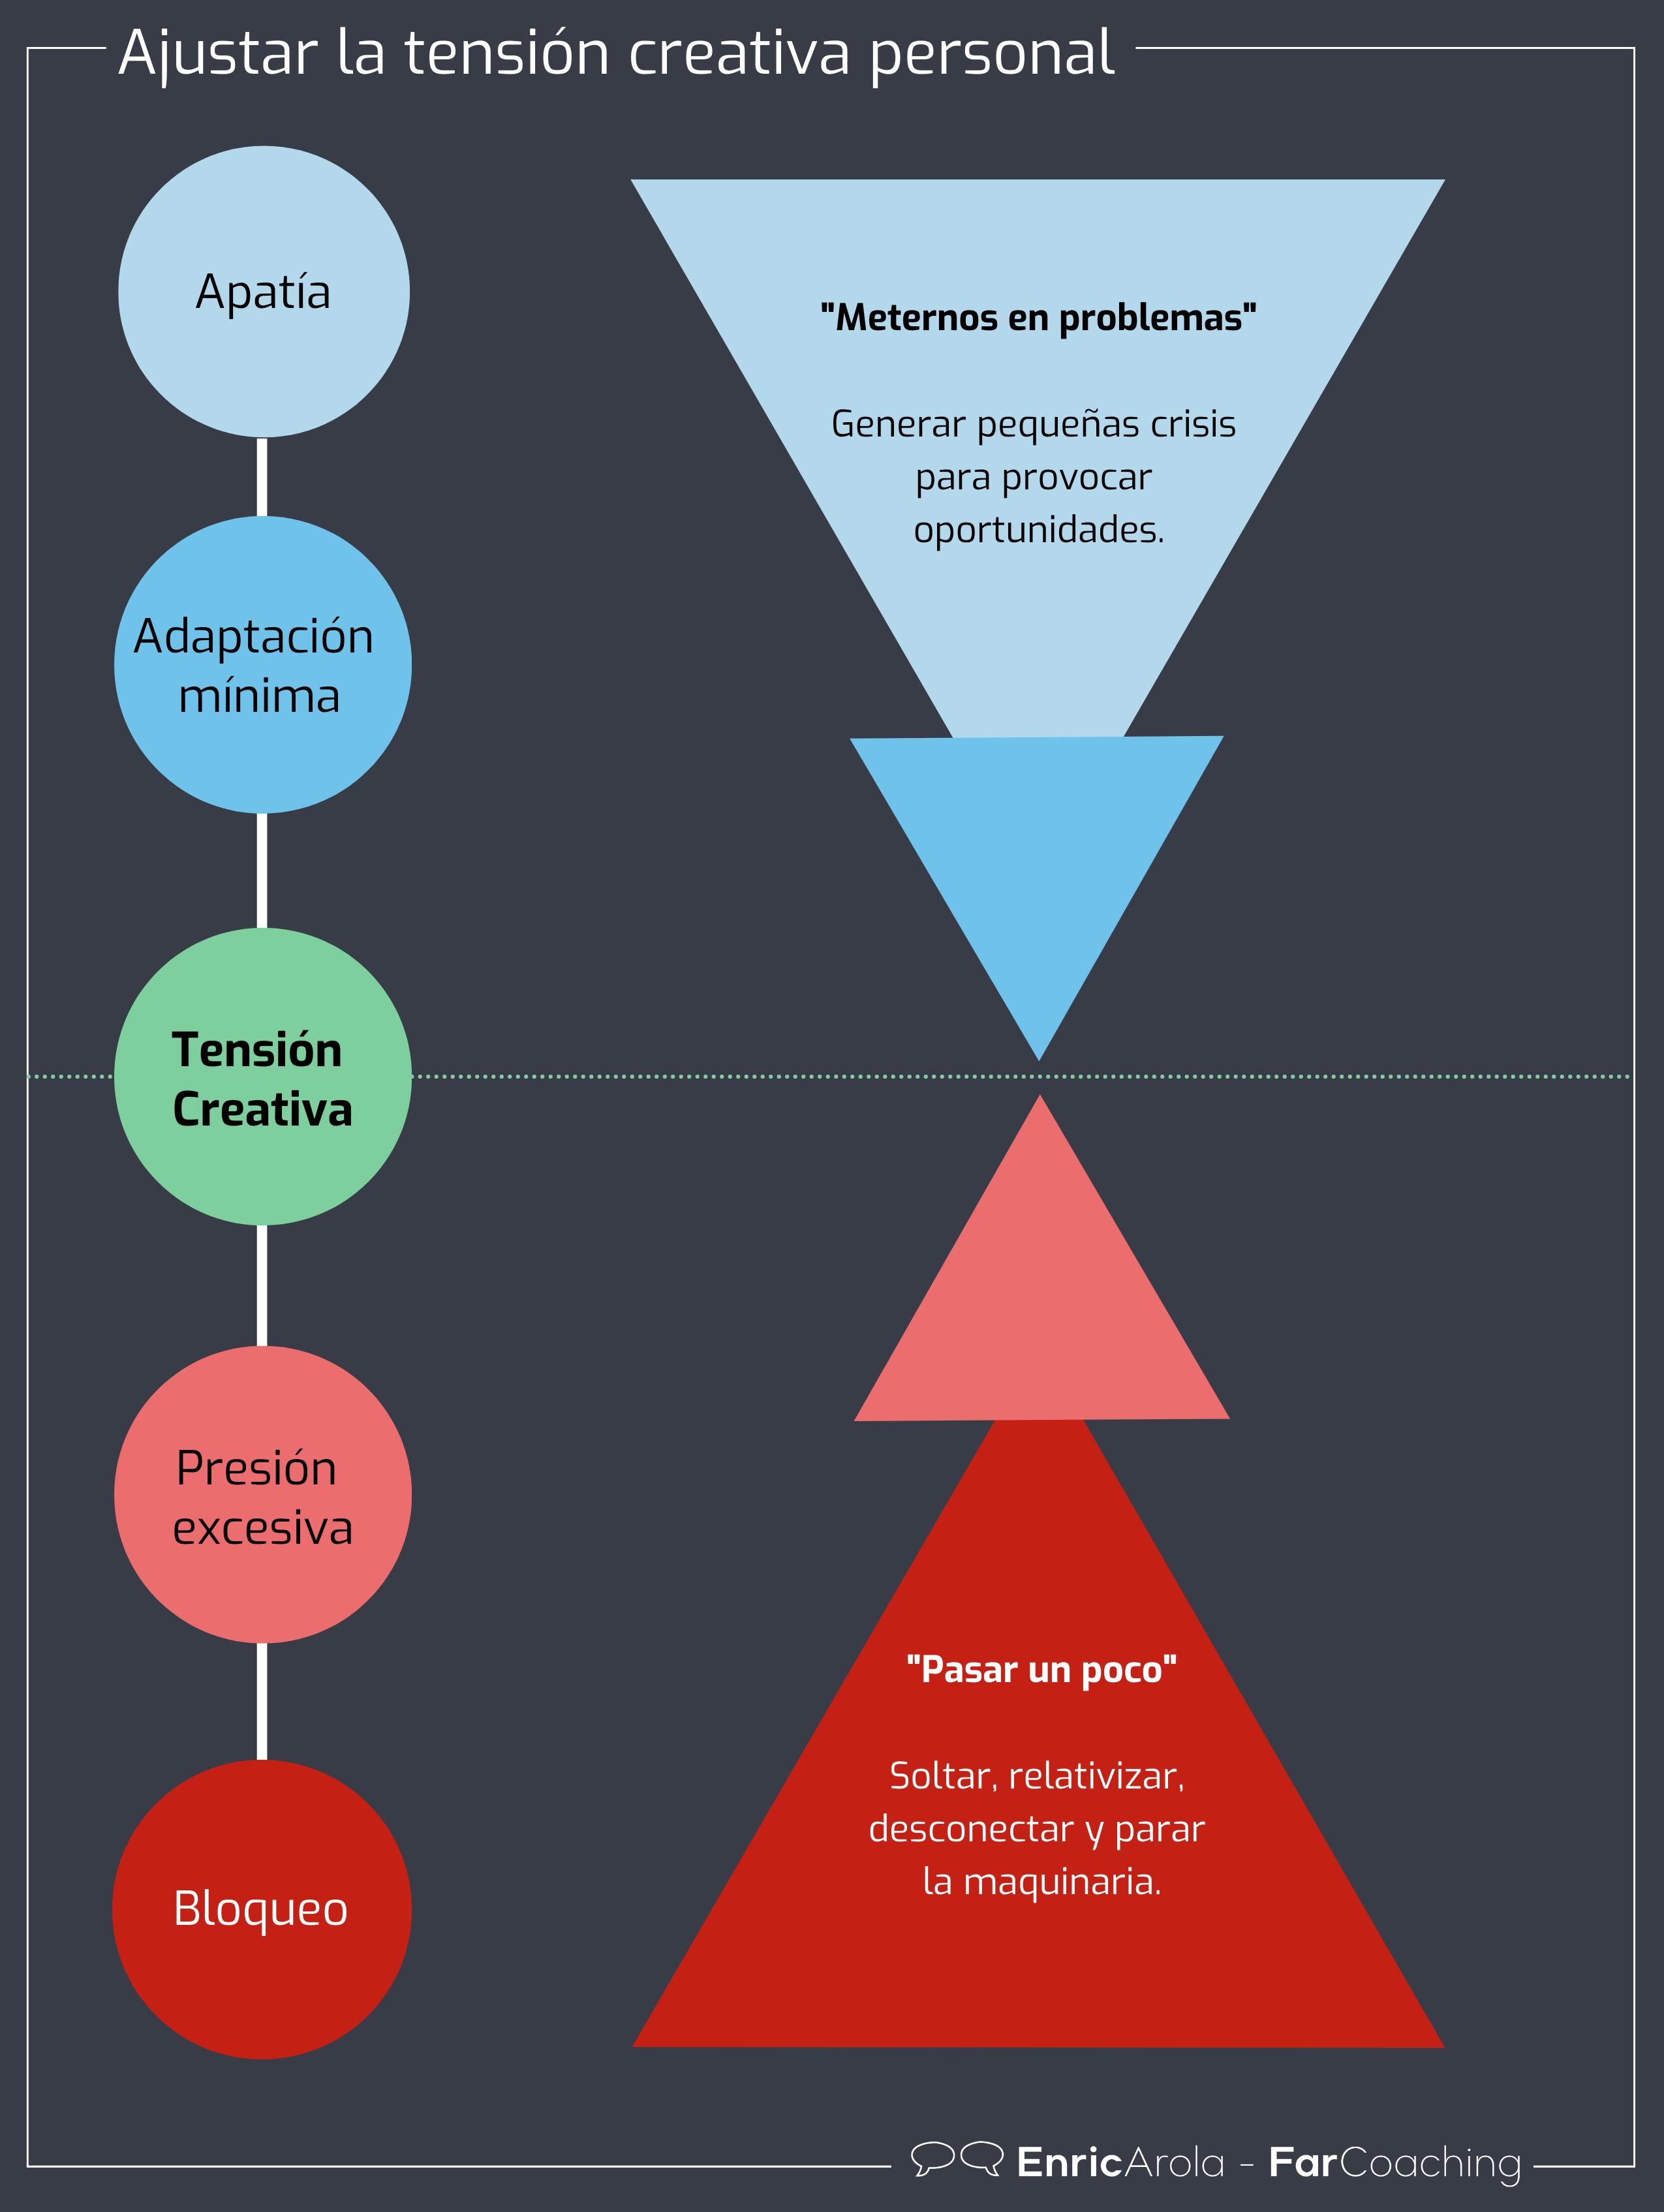 Infografia Ajustar la tensión creativa personal